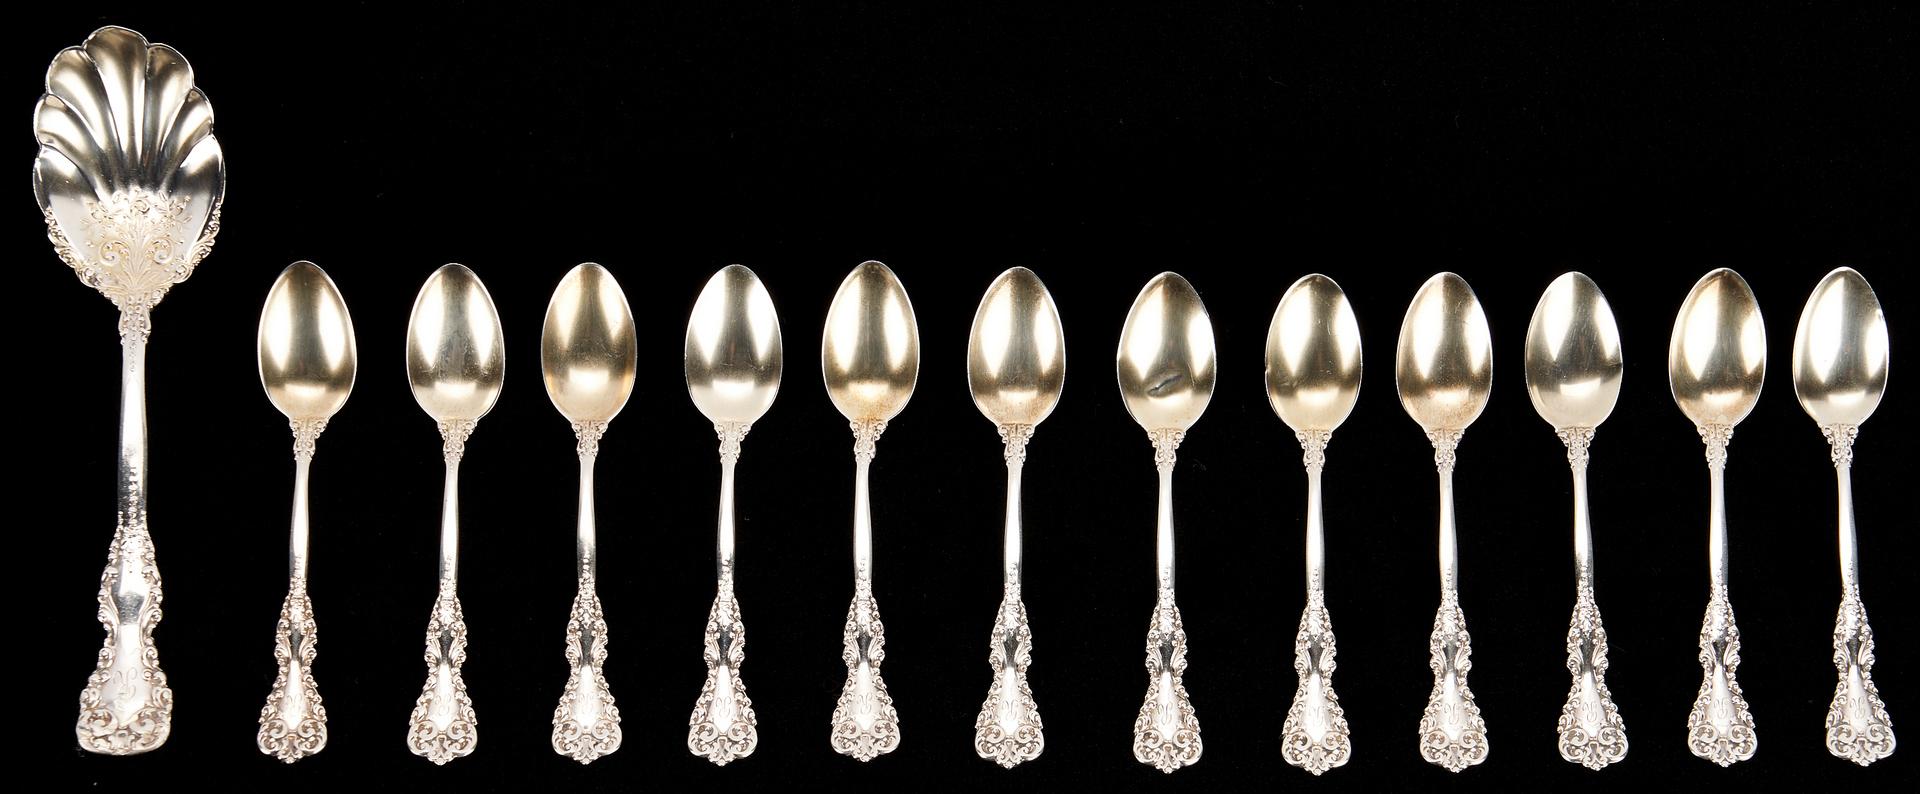 Lot 277: 100 Pcs. International Revere Sterling Silver Flatware